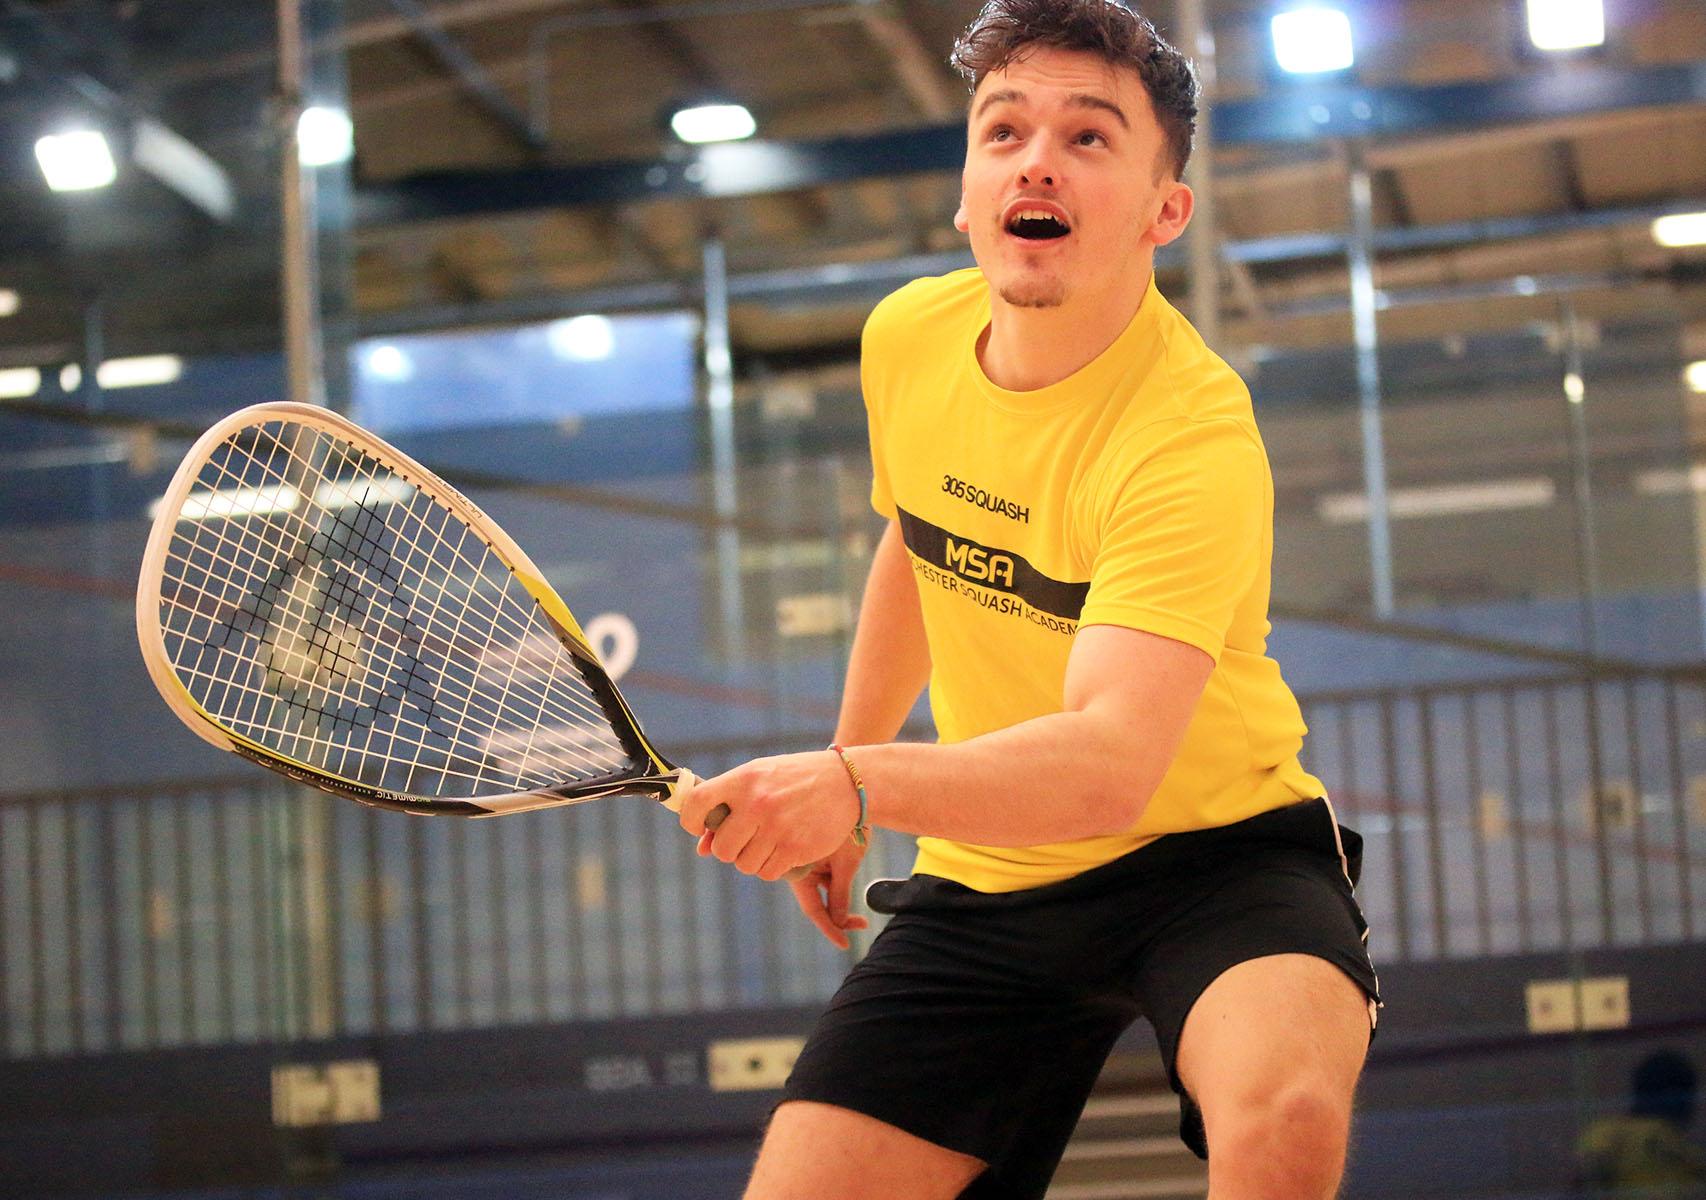 Squash 57 player